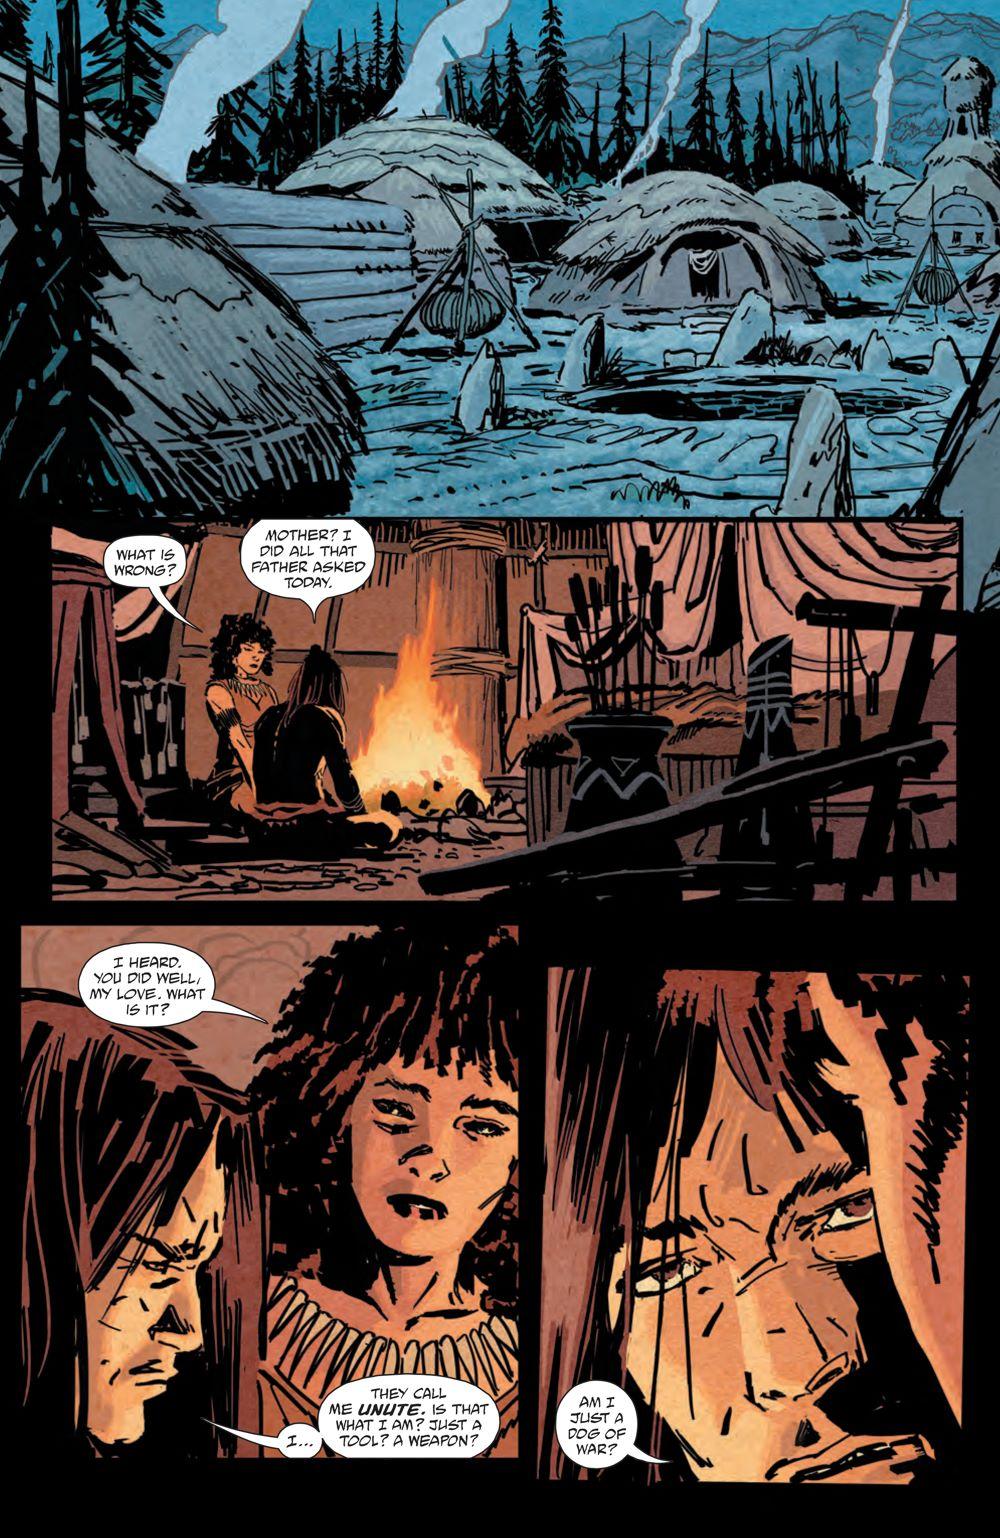 BRZRKR_003_PRESS_6 ComicList Previews: BRZRKR #3 (OF 12)